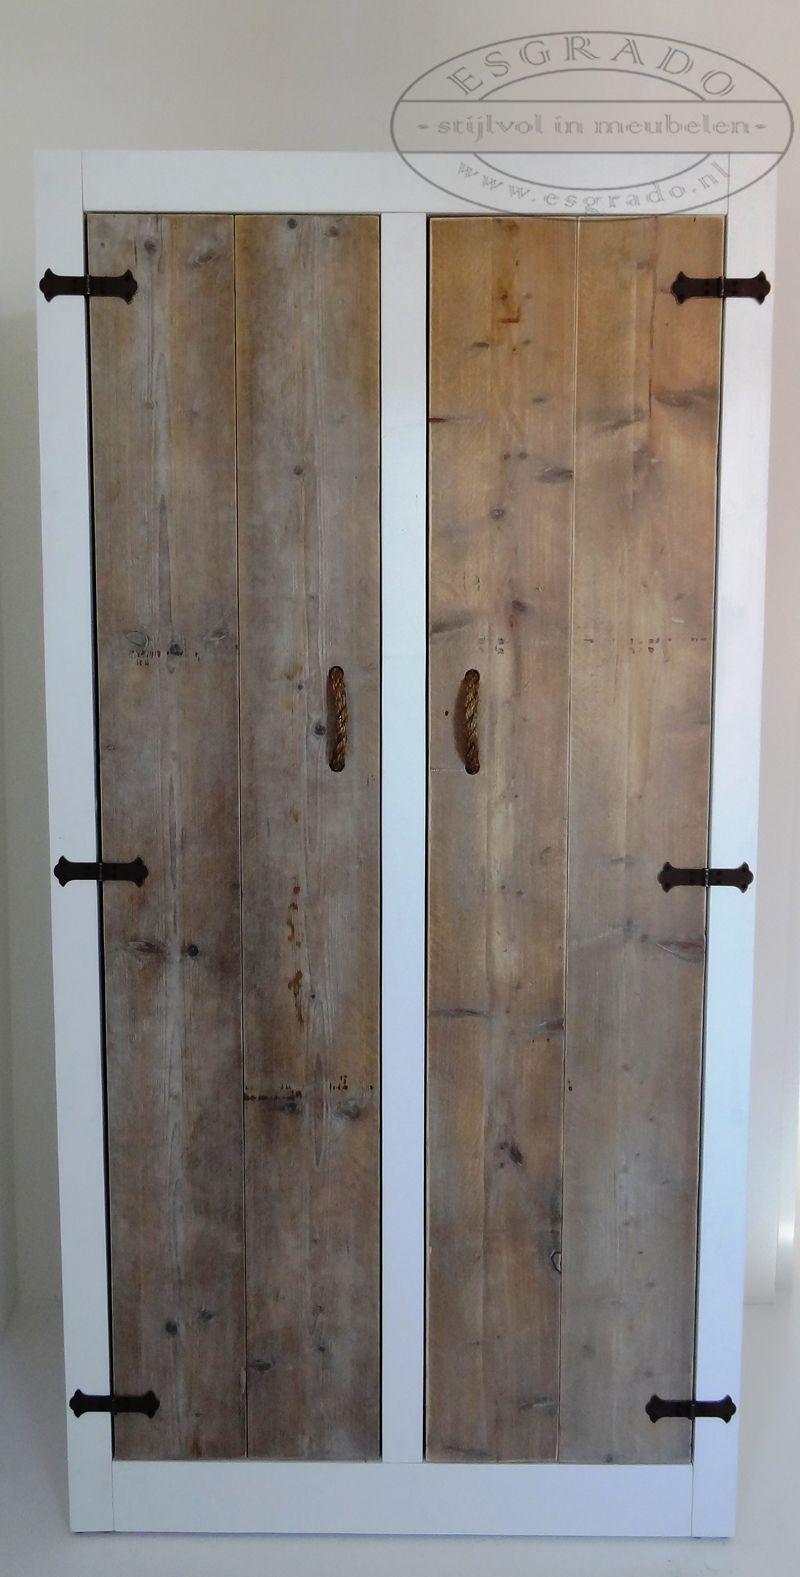 steigerhouten kast - Steigerhouten meubels op maat | Pinterest ...